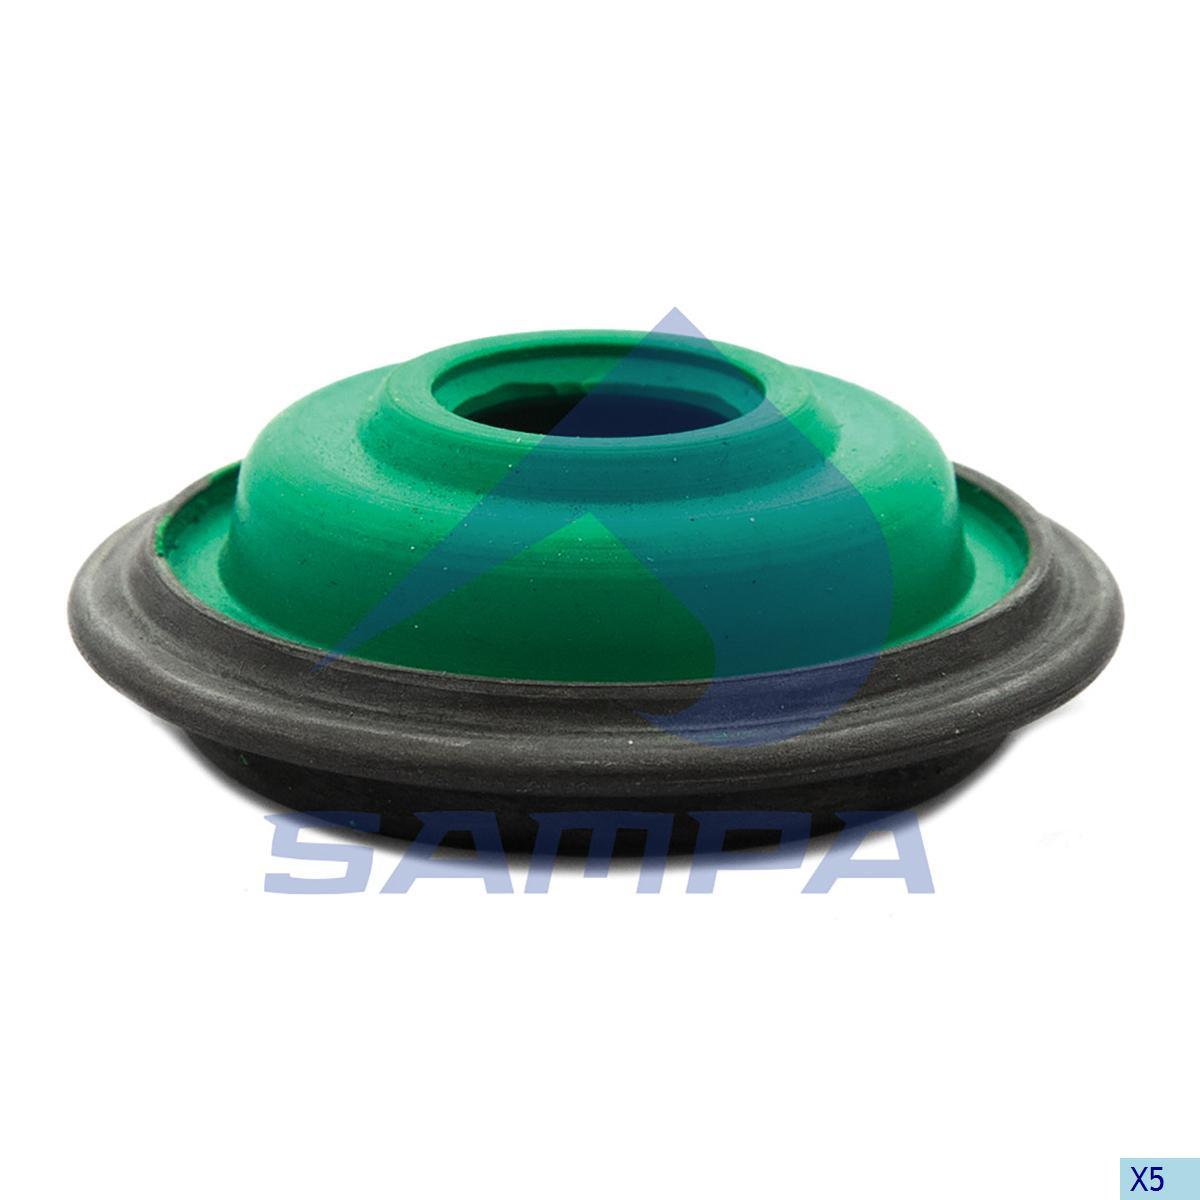 Dust Cover, Brake Adjuster, Iveco, Brake